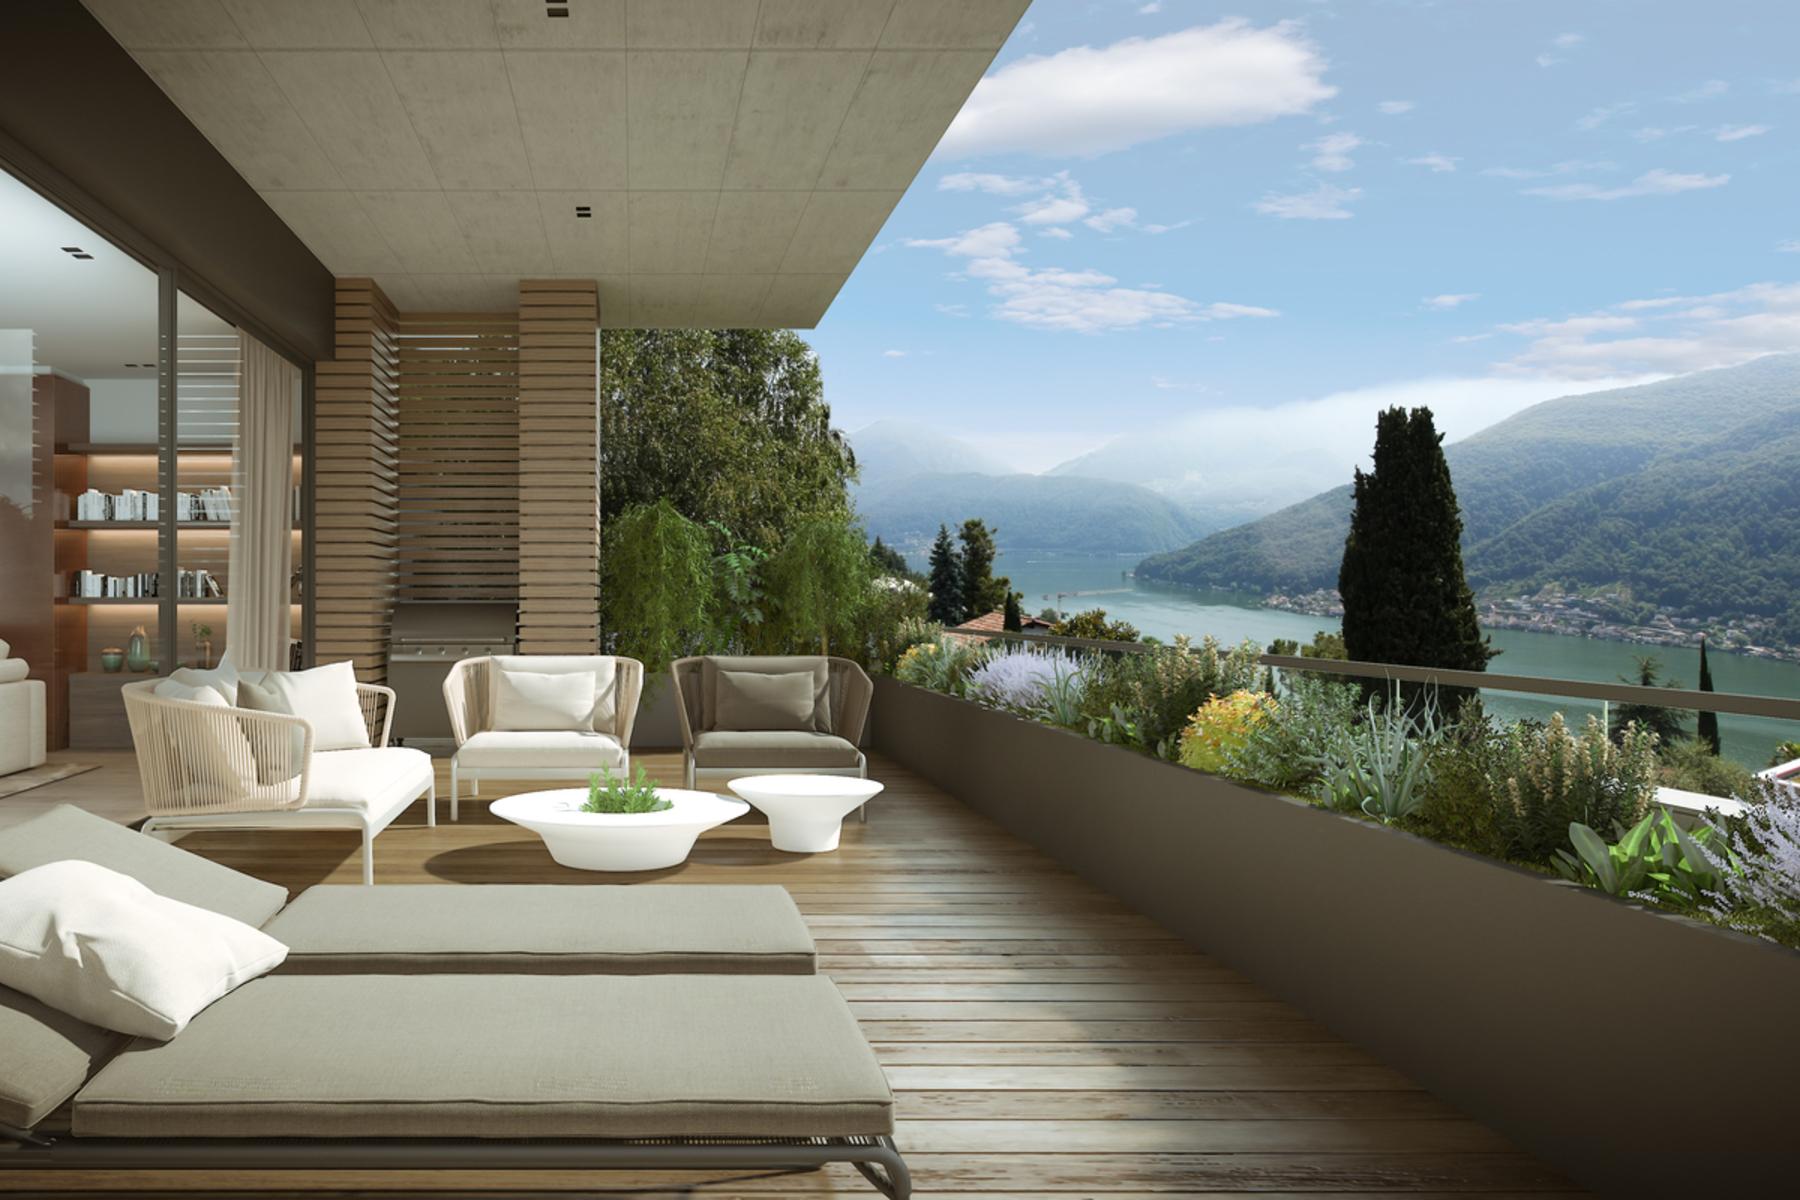 Casa para uma família para Venda às New villa in the Morcote Castle Estate Vico Morcote, Vico Morcote, Ticino, 6921 Suíça